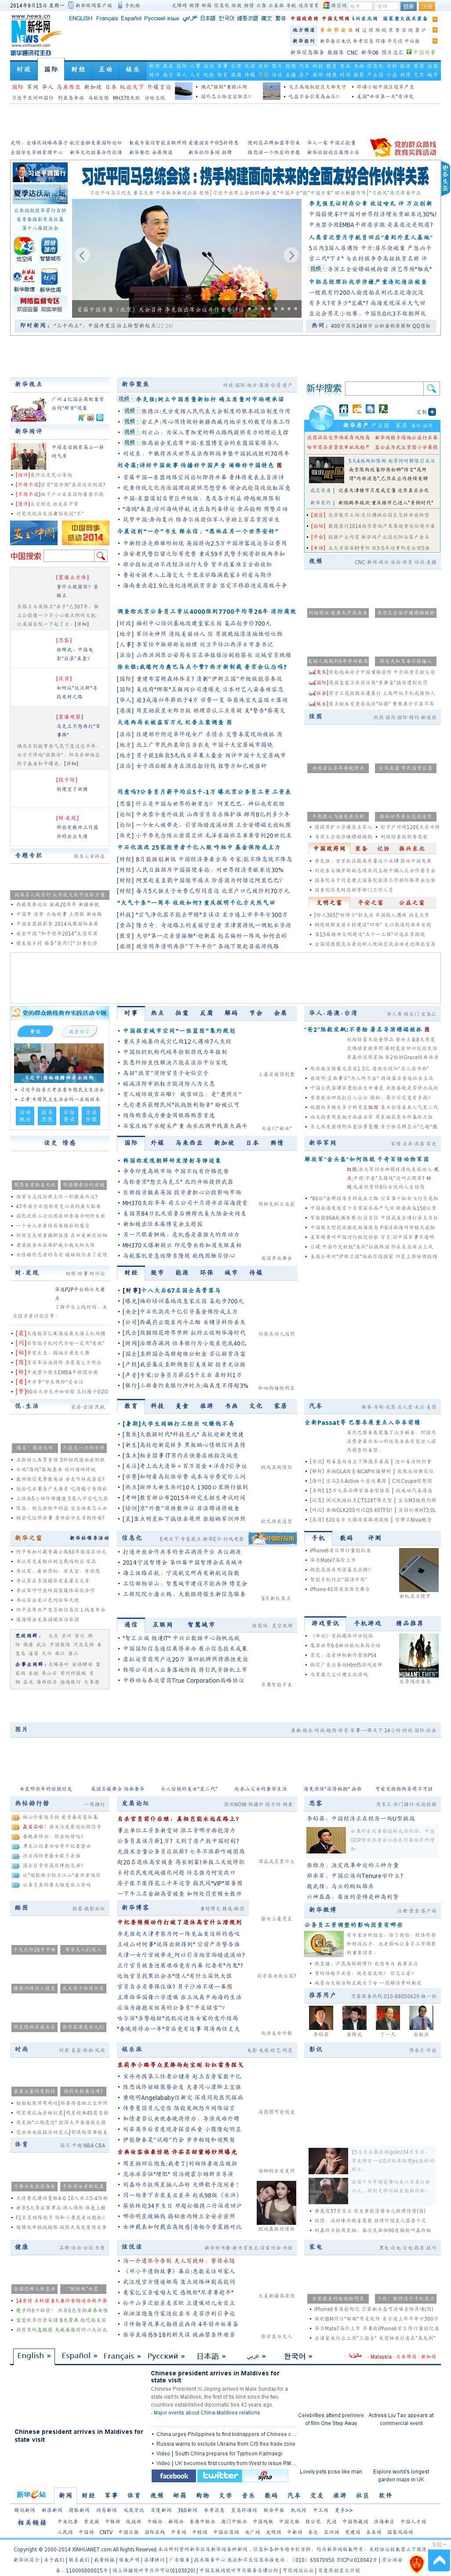 Xinhua at Monday Sept. 15, 2014, 3:21 p.m. UTC